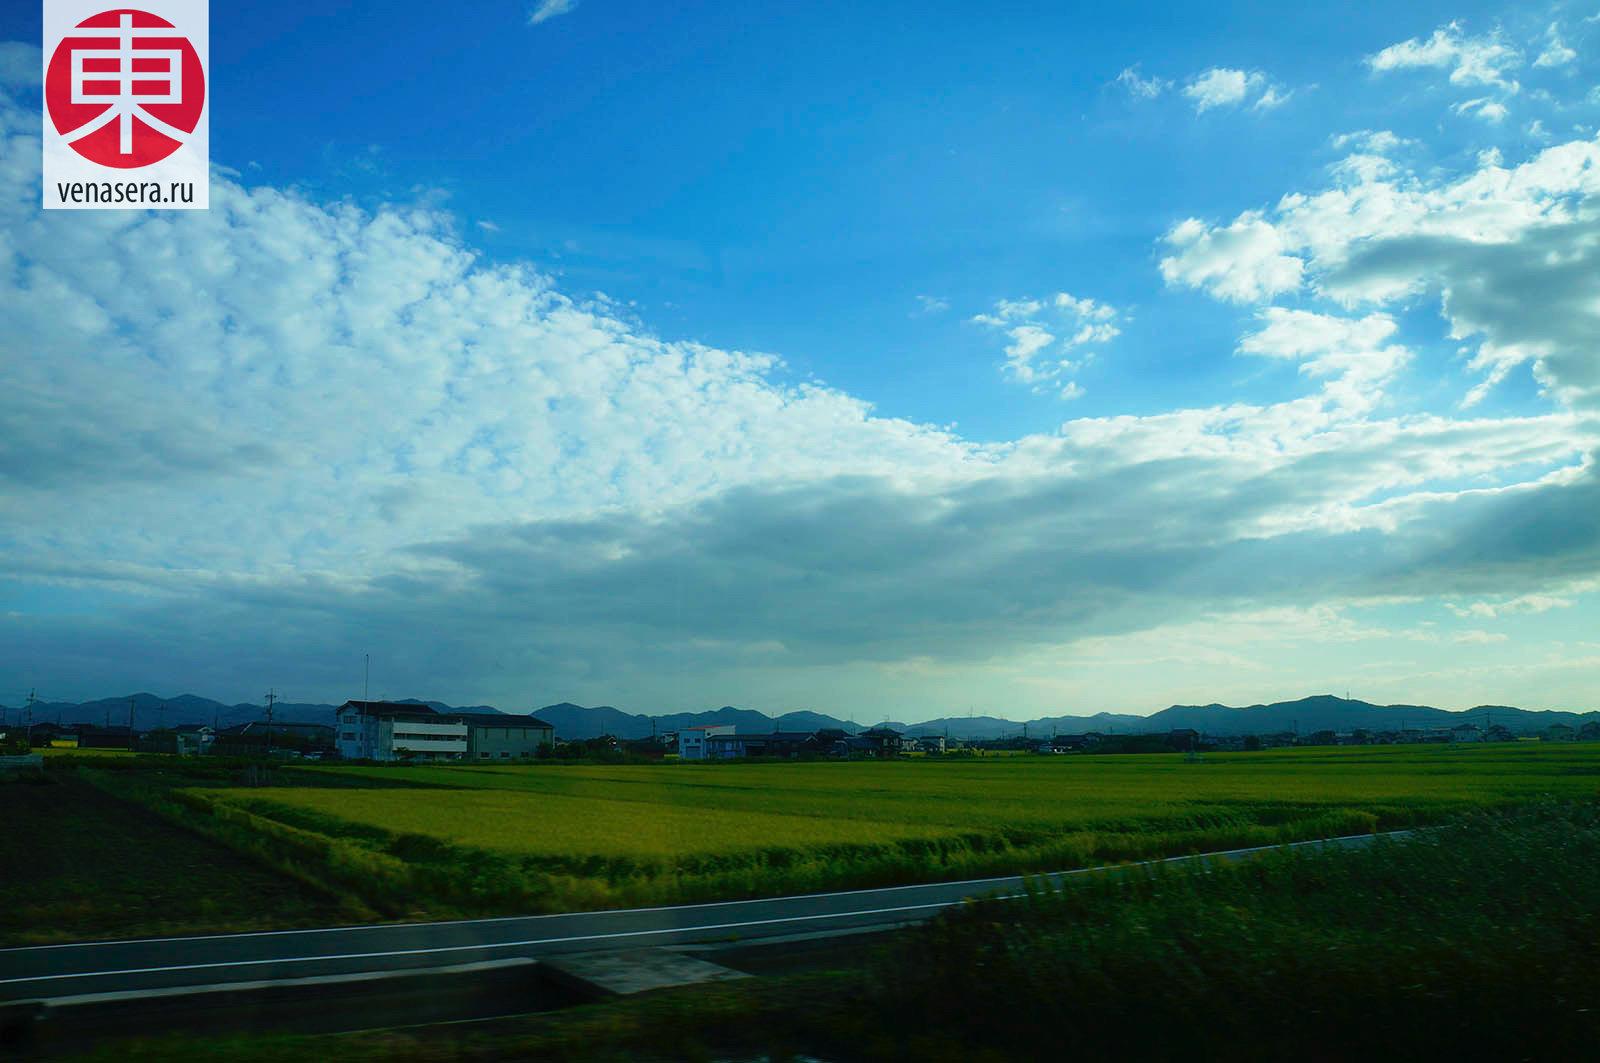 Такамацу, Takamatsu, 高松, Сикоку, Shikoku, 四国, Япония, Japan, 日本.